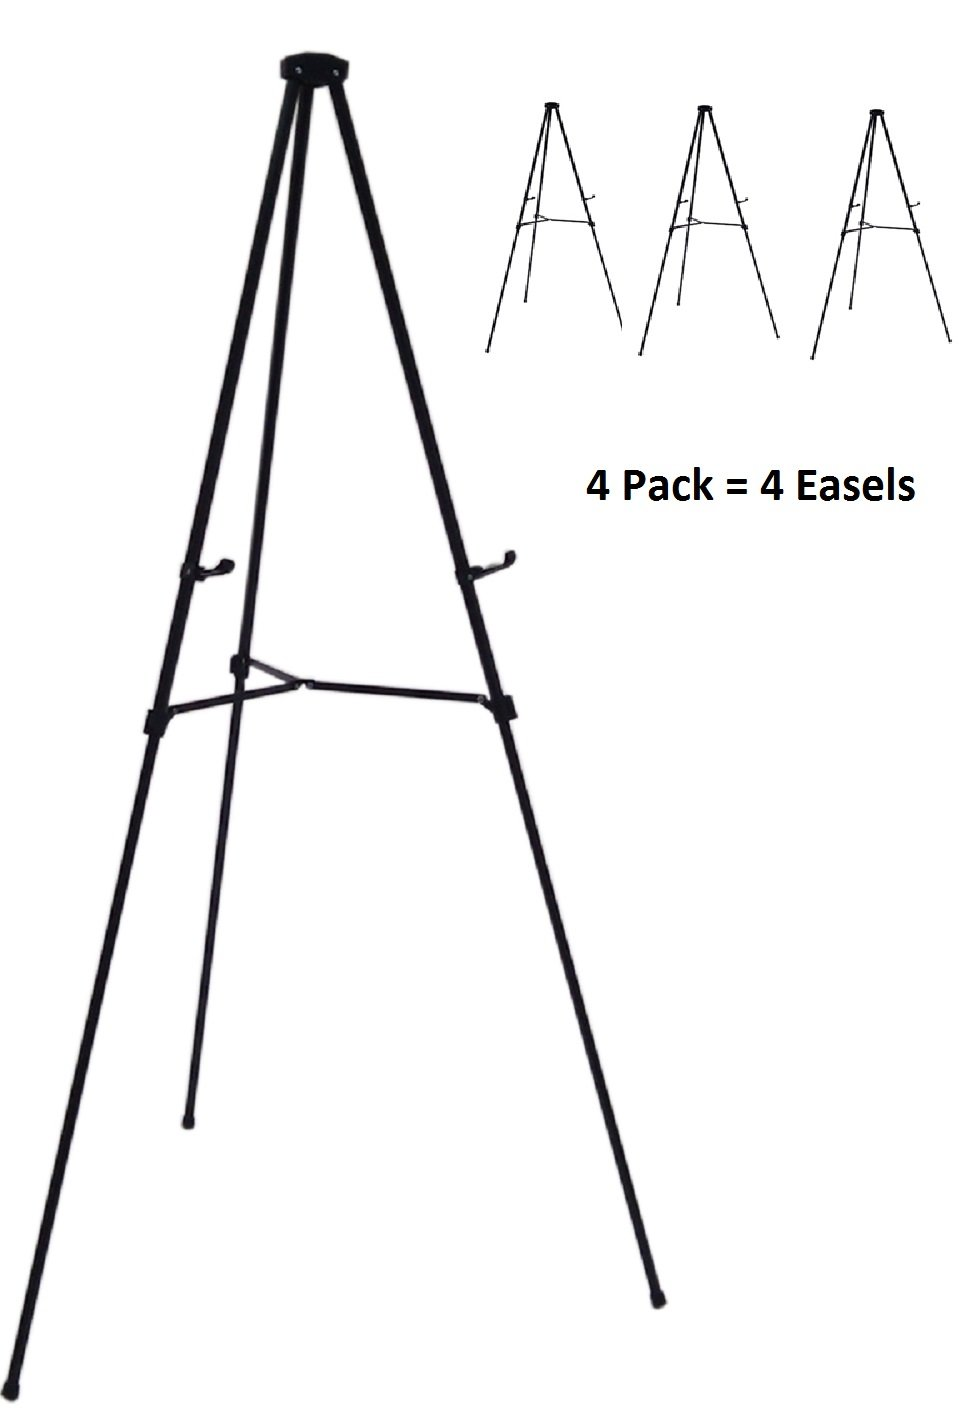 Pack of 4 Lightweight Aluminum Telescoping Display Easel, Black (4 pack)